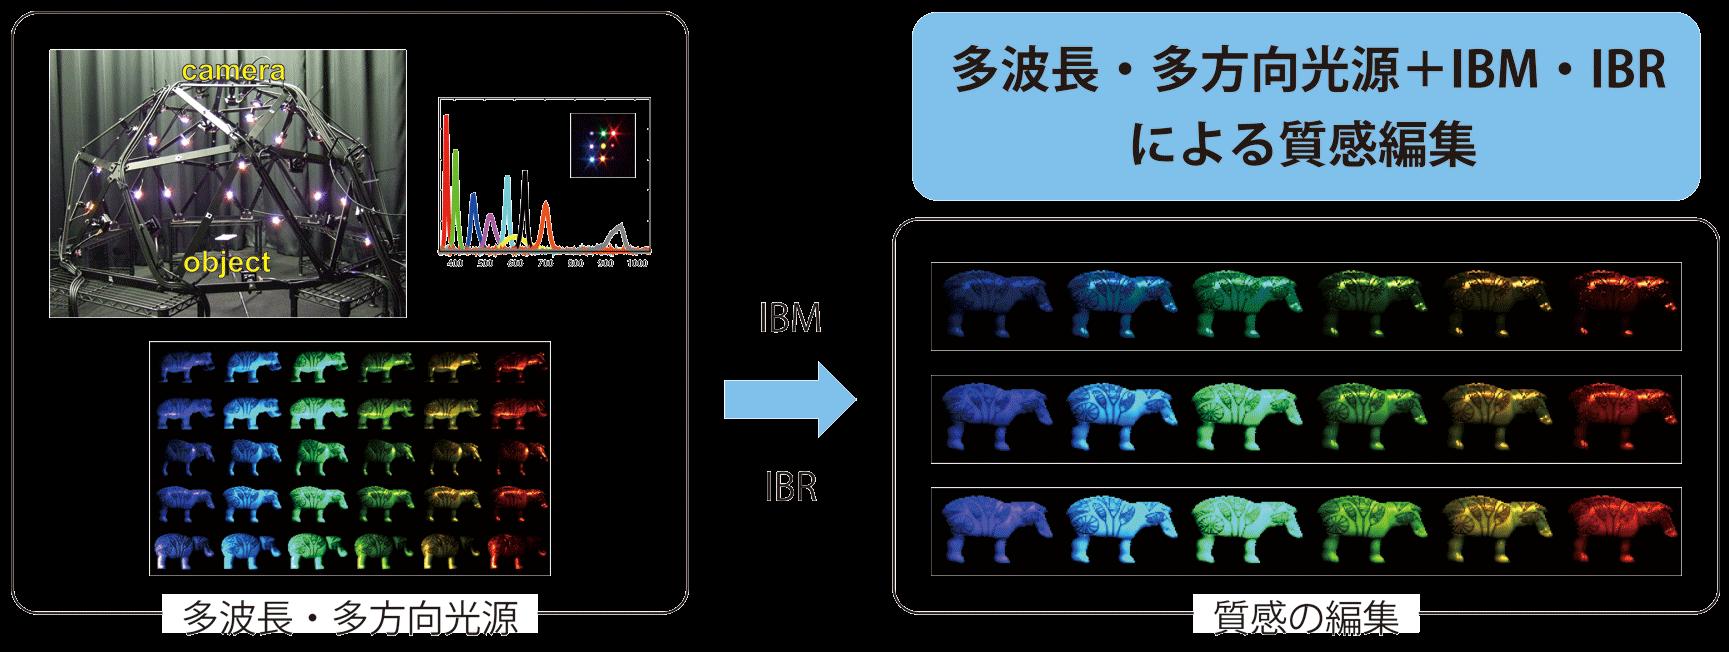 d02-6_overview_j.png